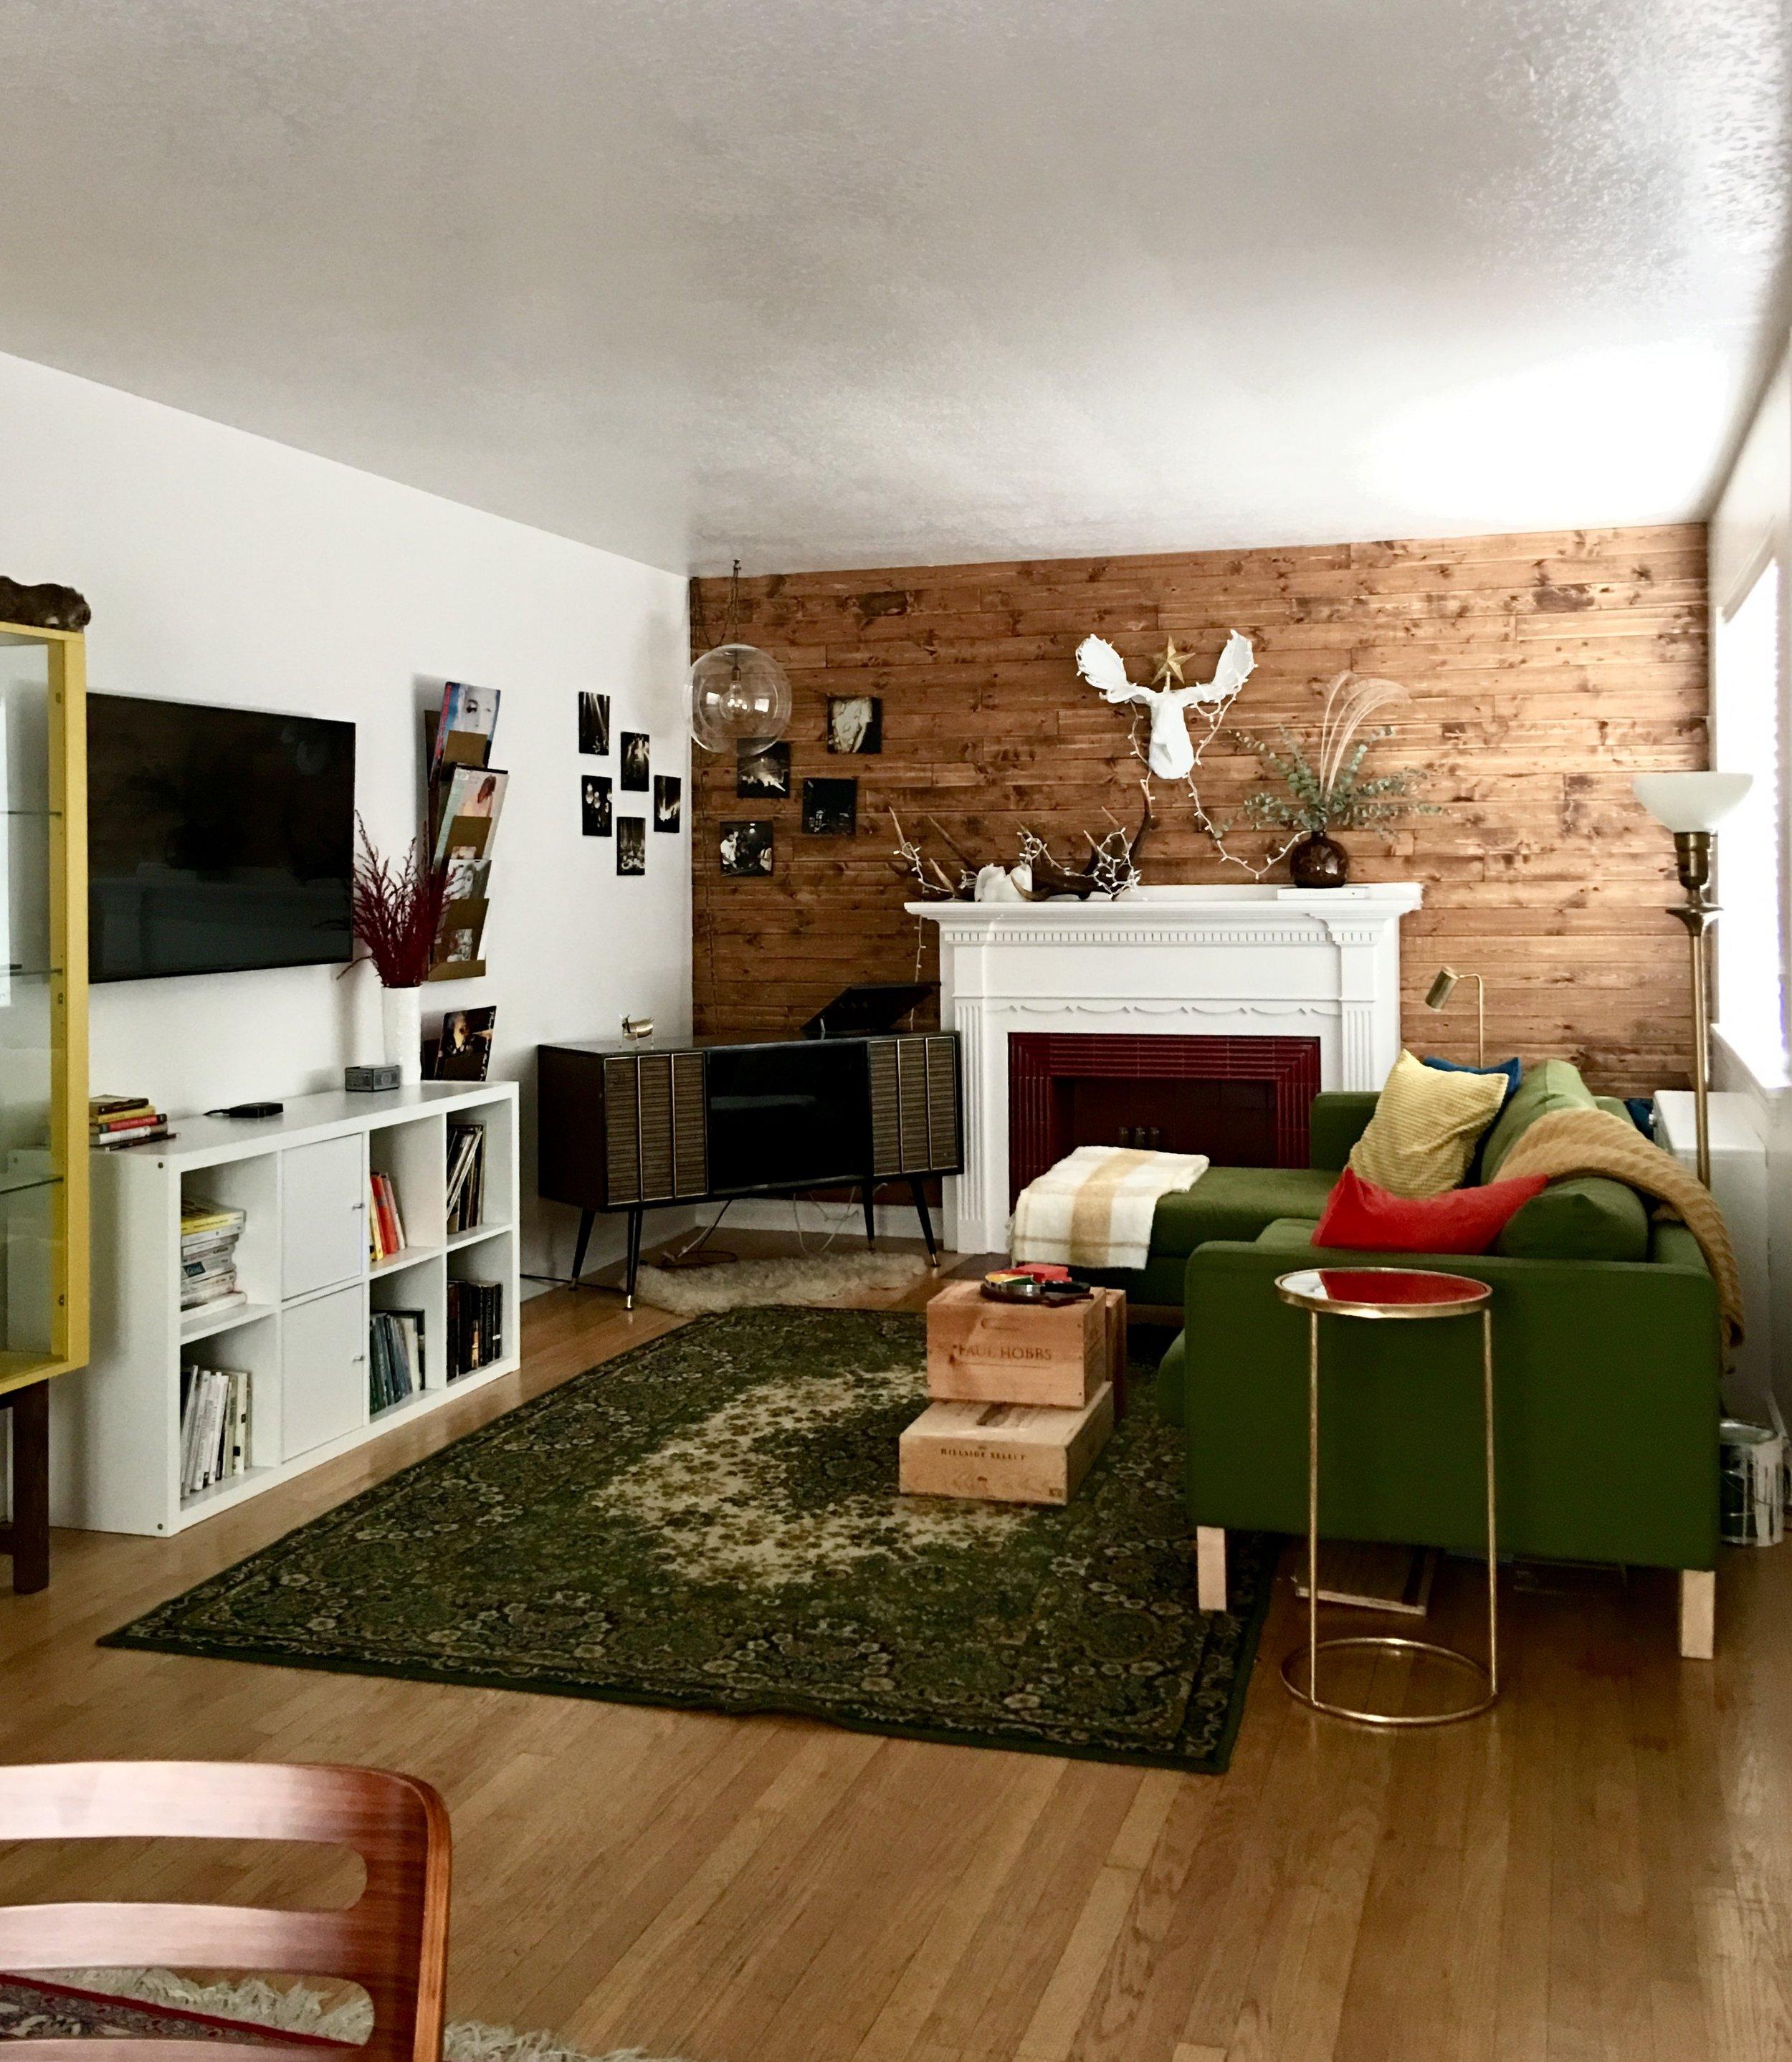 snackface-portland-airbnb.jpg